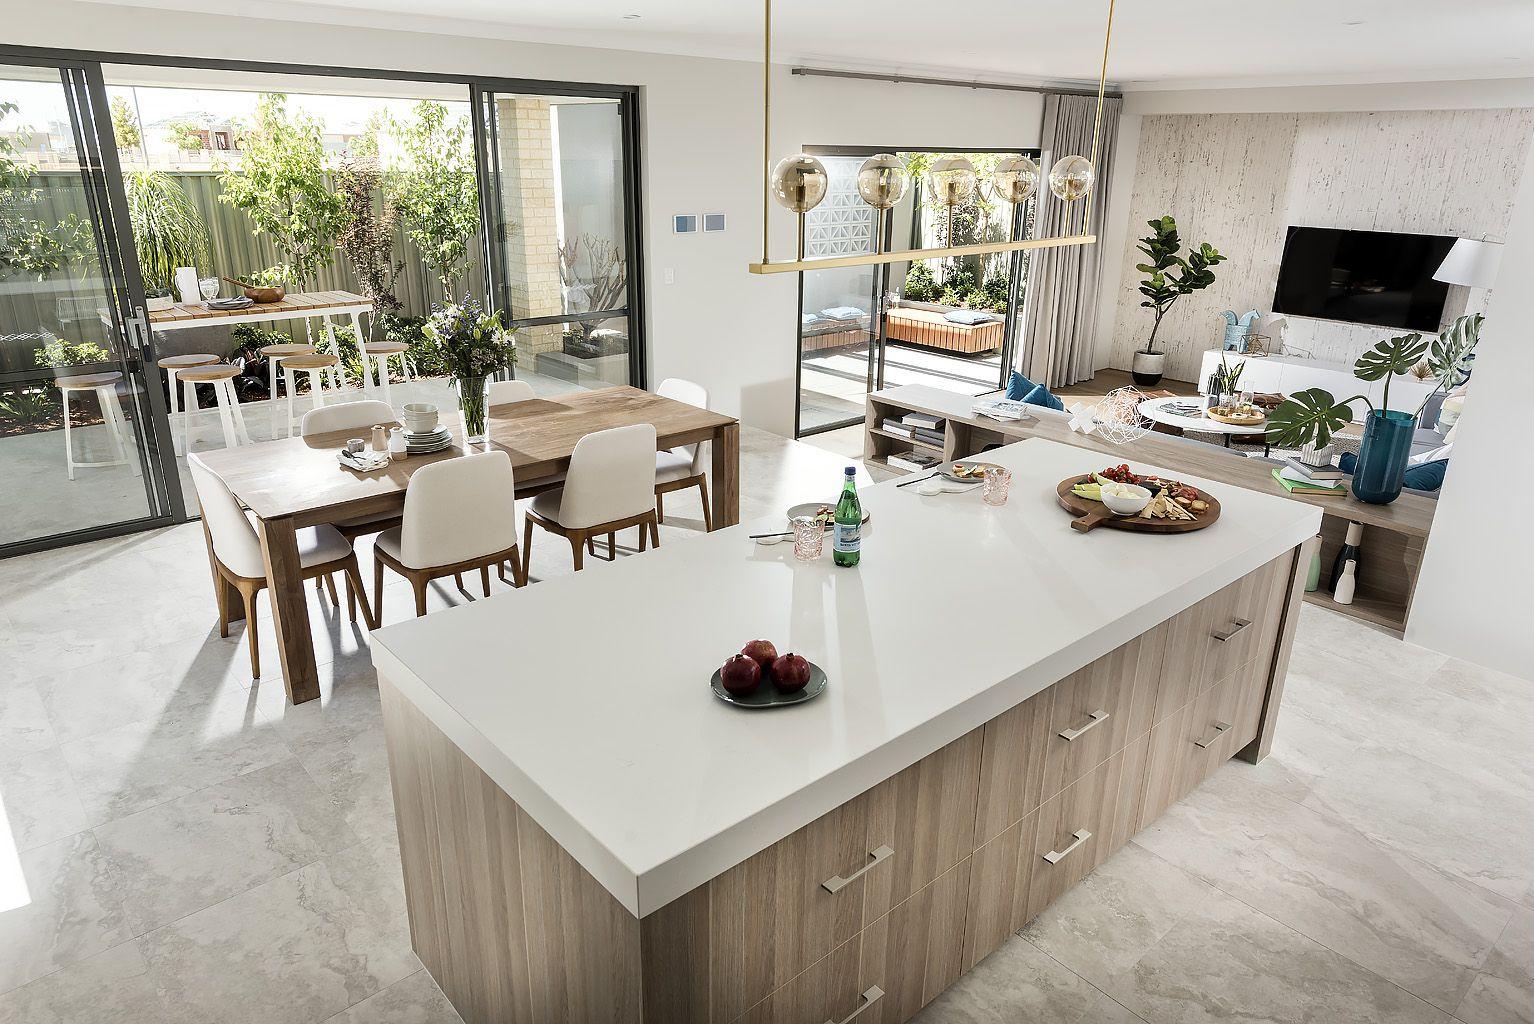 Pin by Molly Morléy on - My Australian Home Ideas - | Pinterest ...